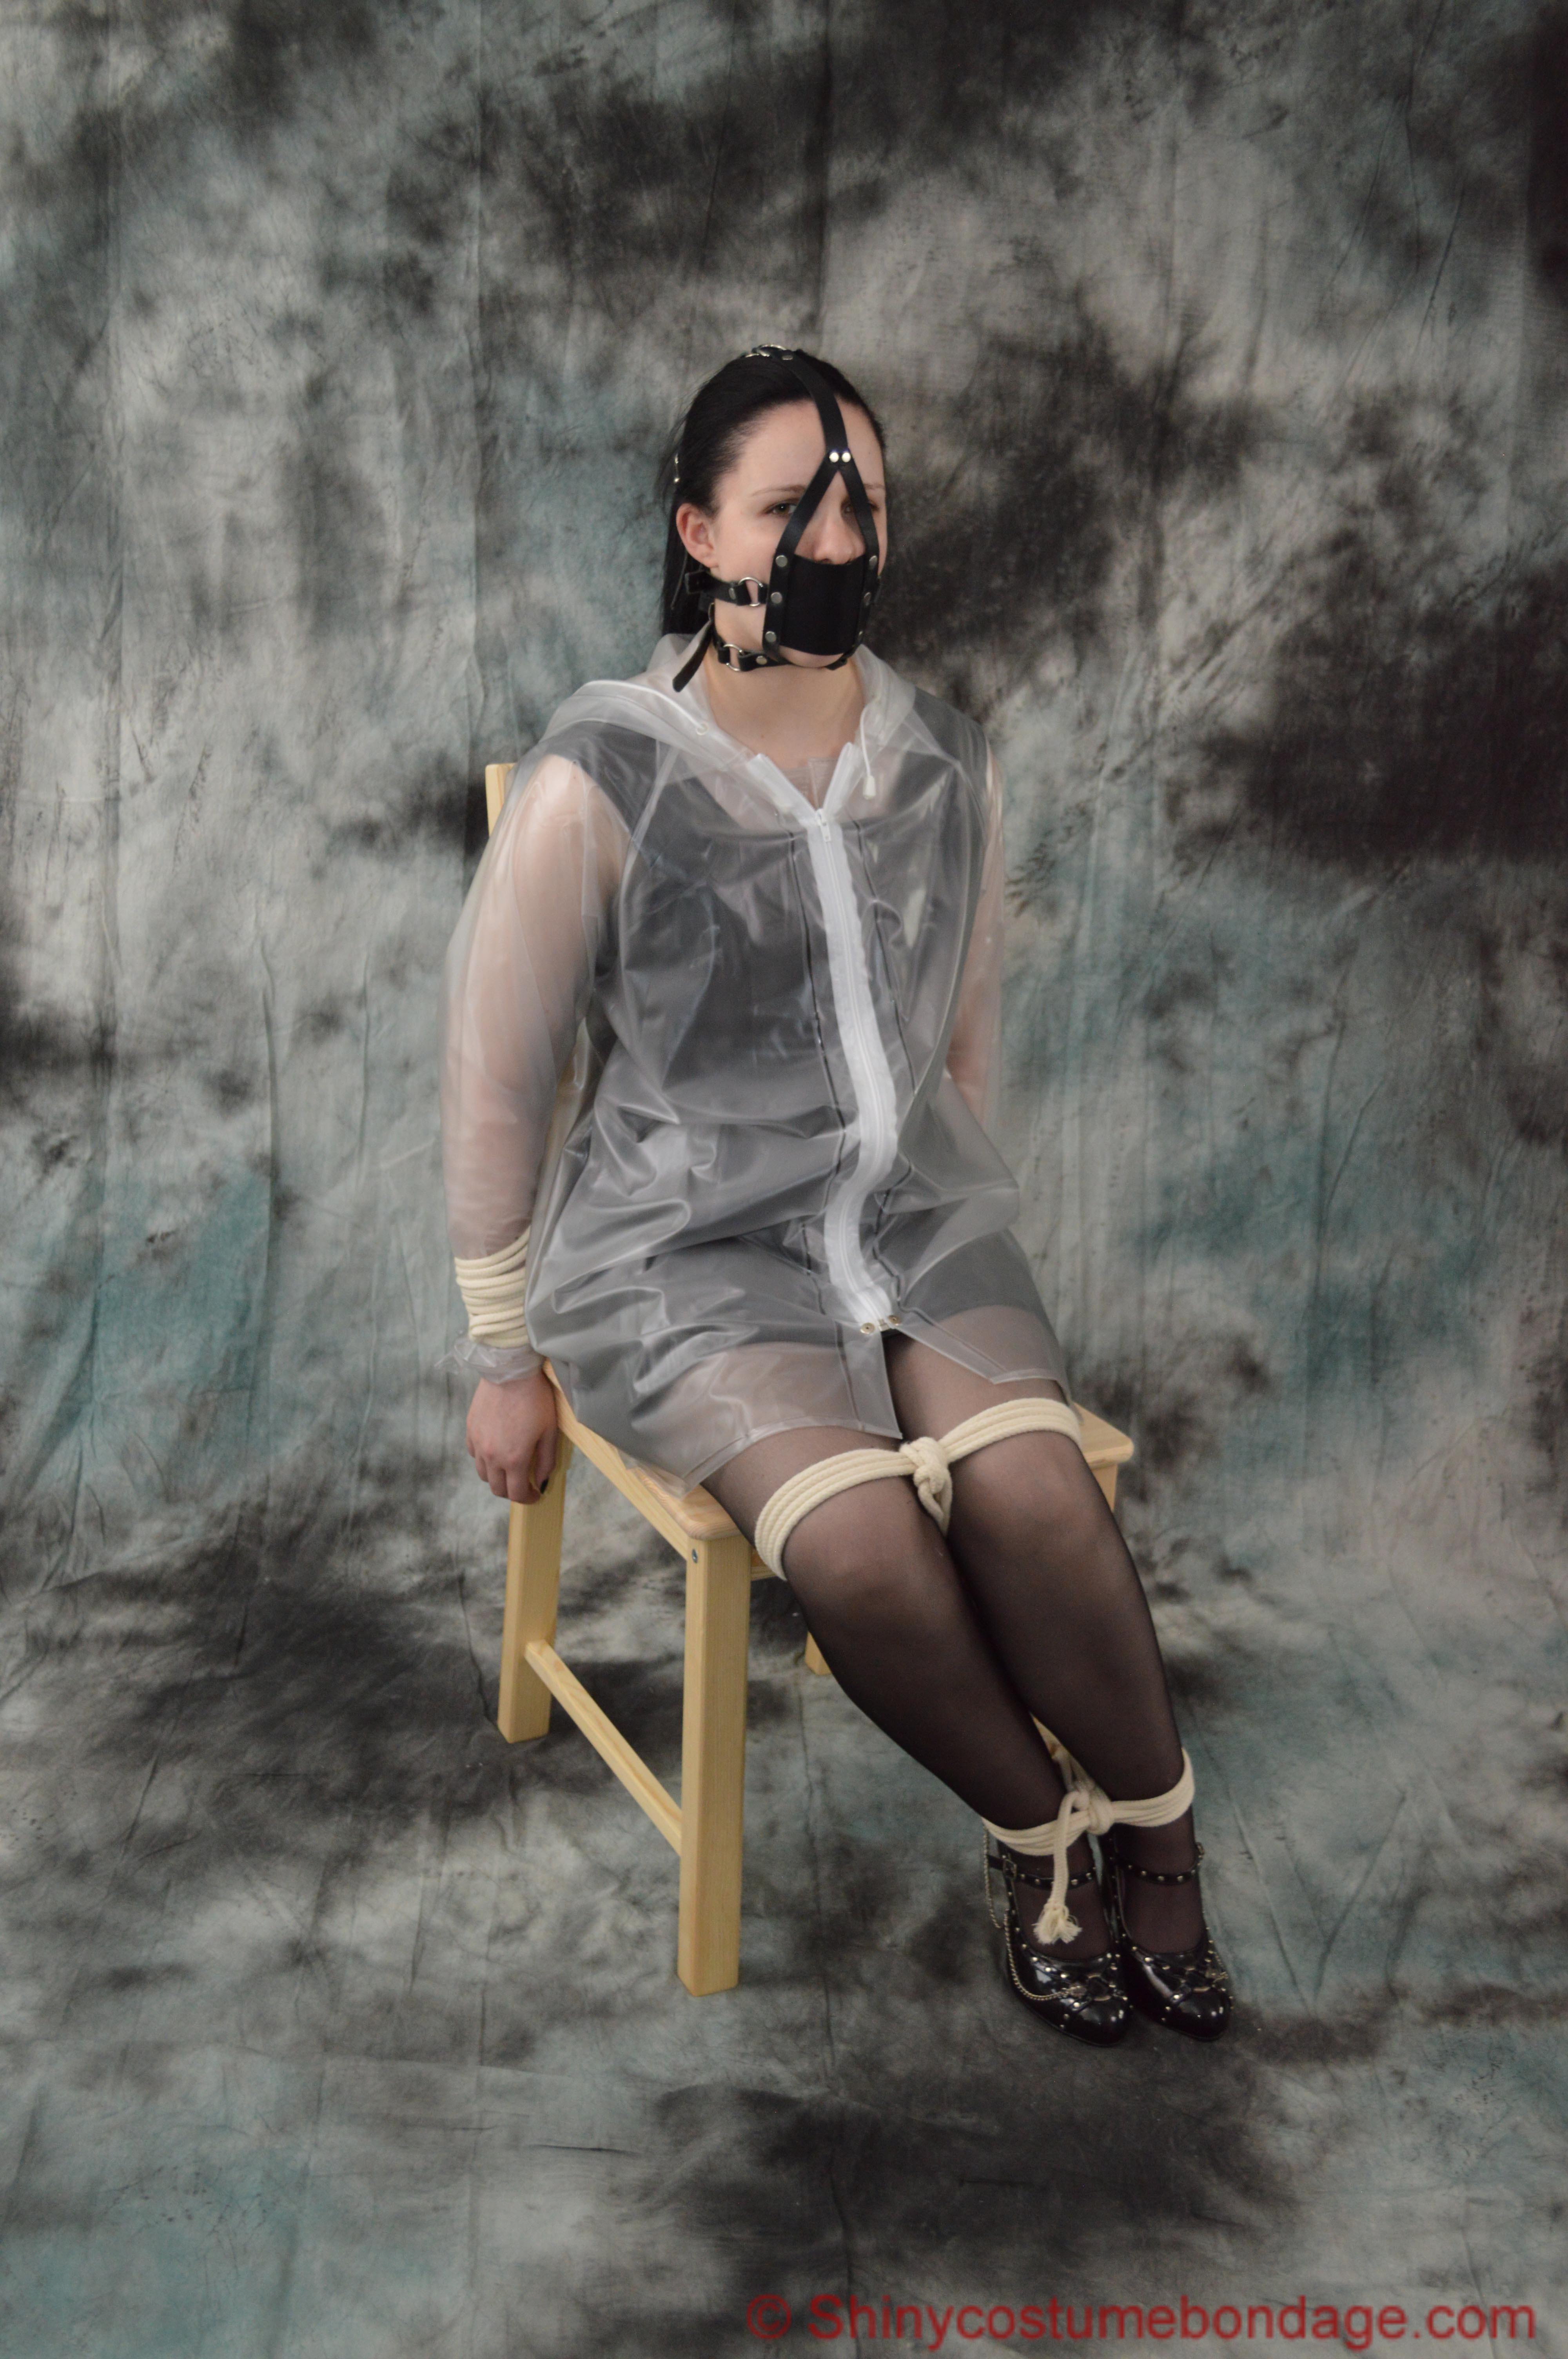 Shiny Costume Bondage | Bound in school uniform part 3